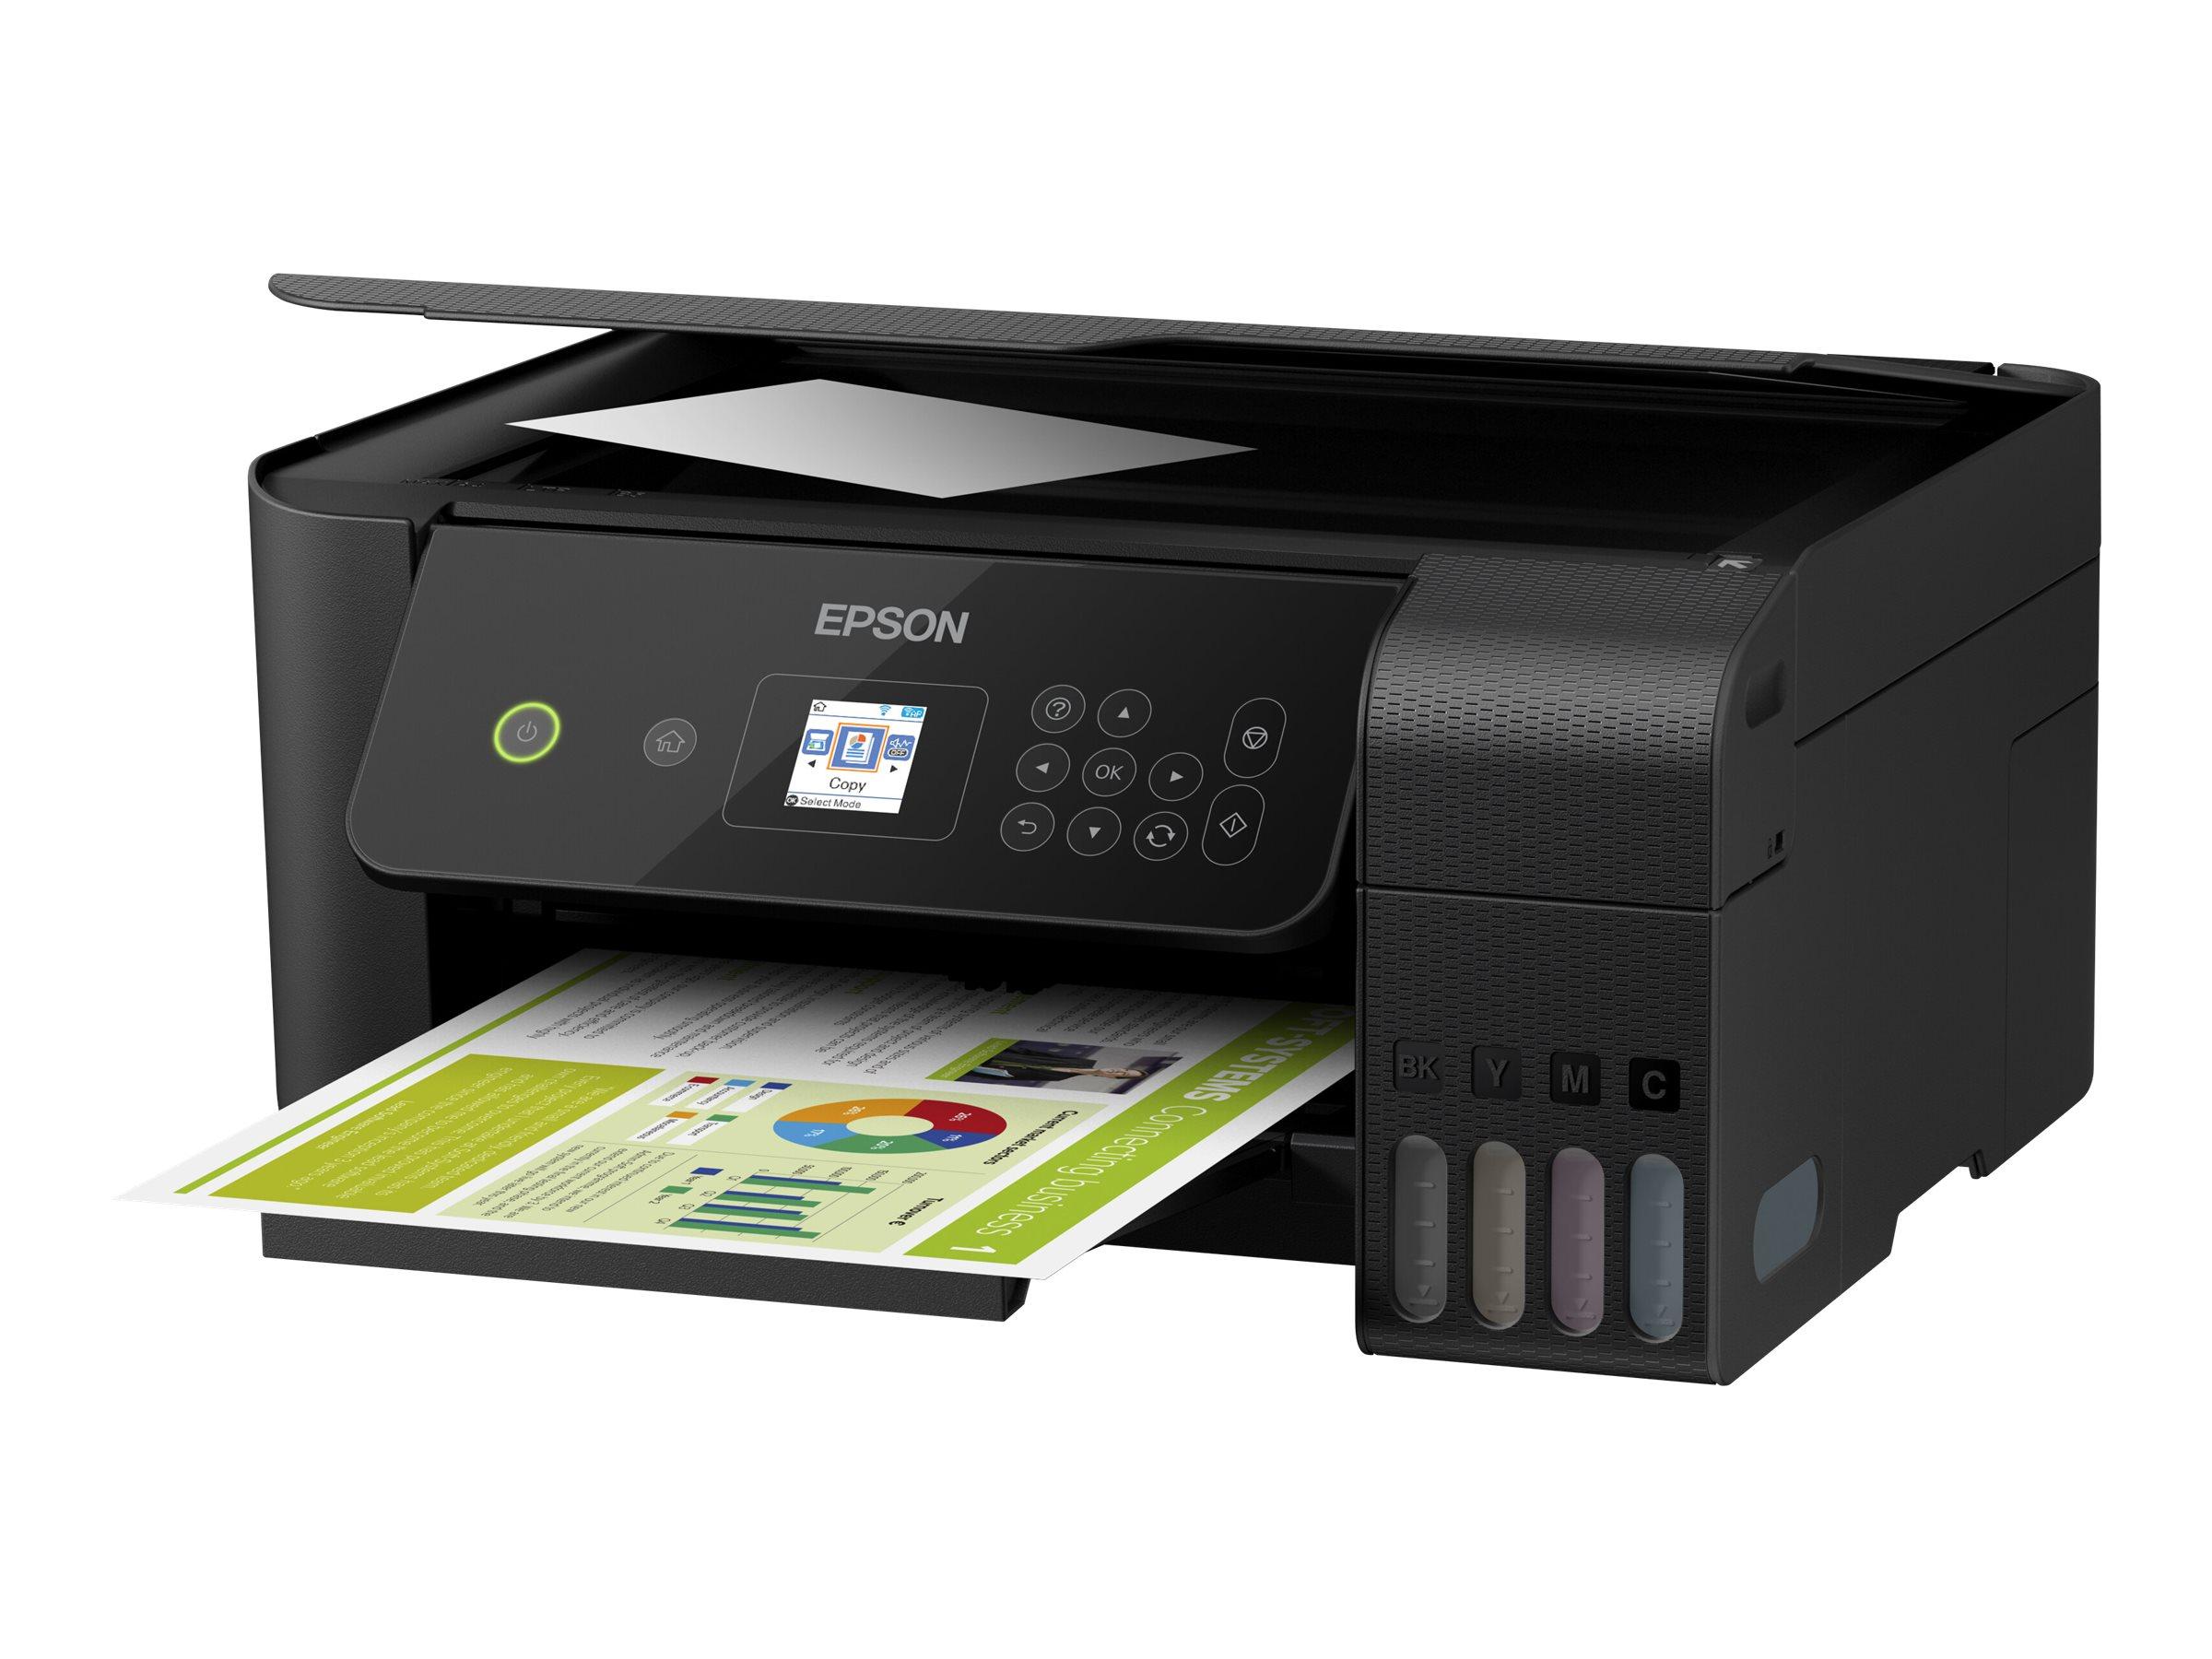 Epson EcoTank ET-2720 - Multifunktionsdrucker - Farbe - Tintenstrahl - refillable - A4/Legal (Medien)